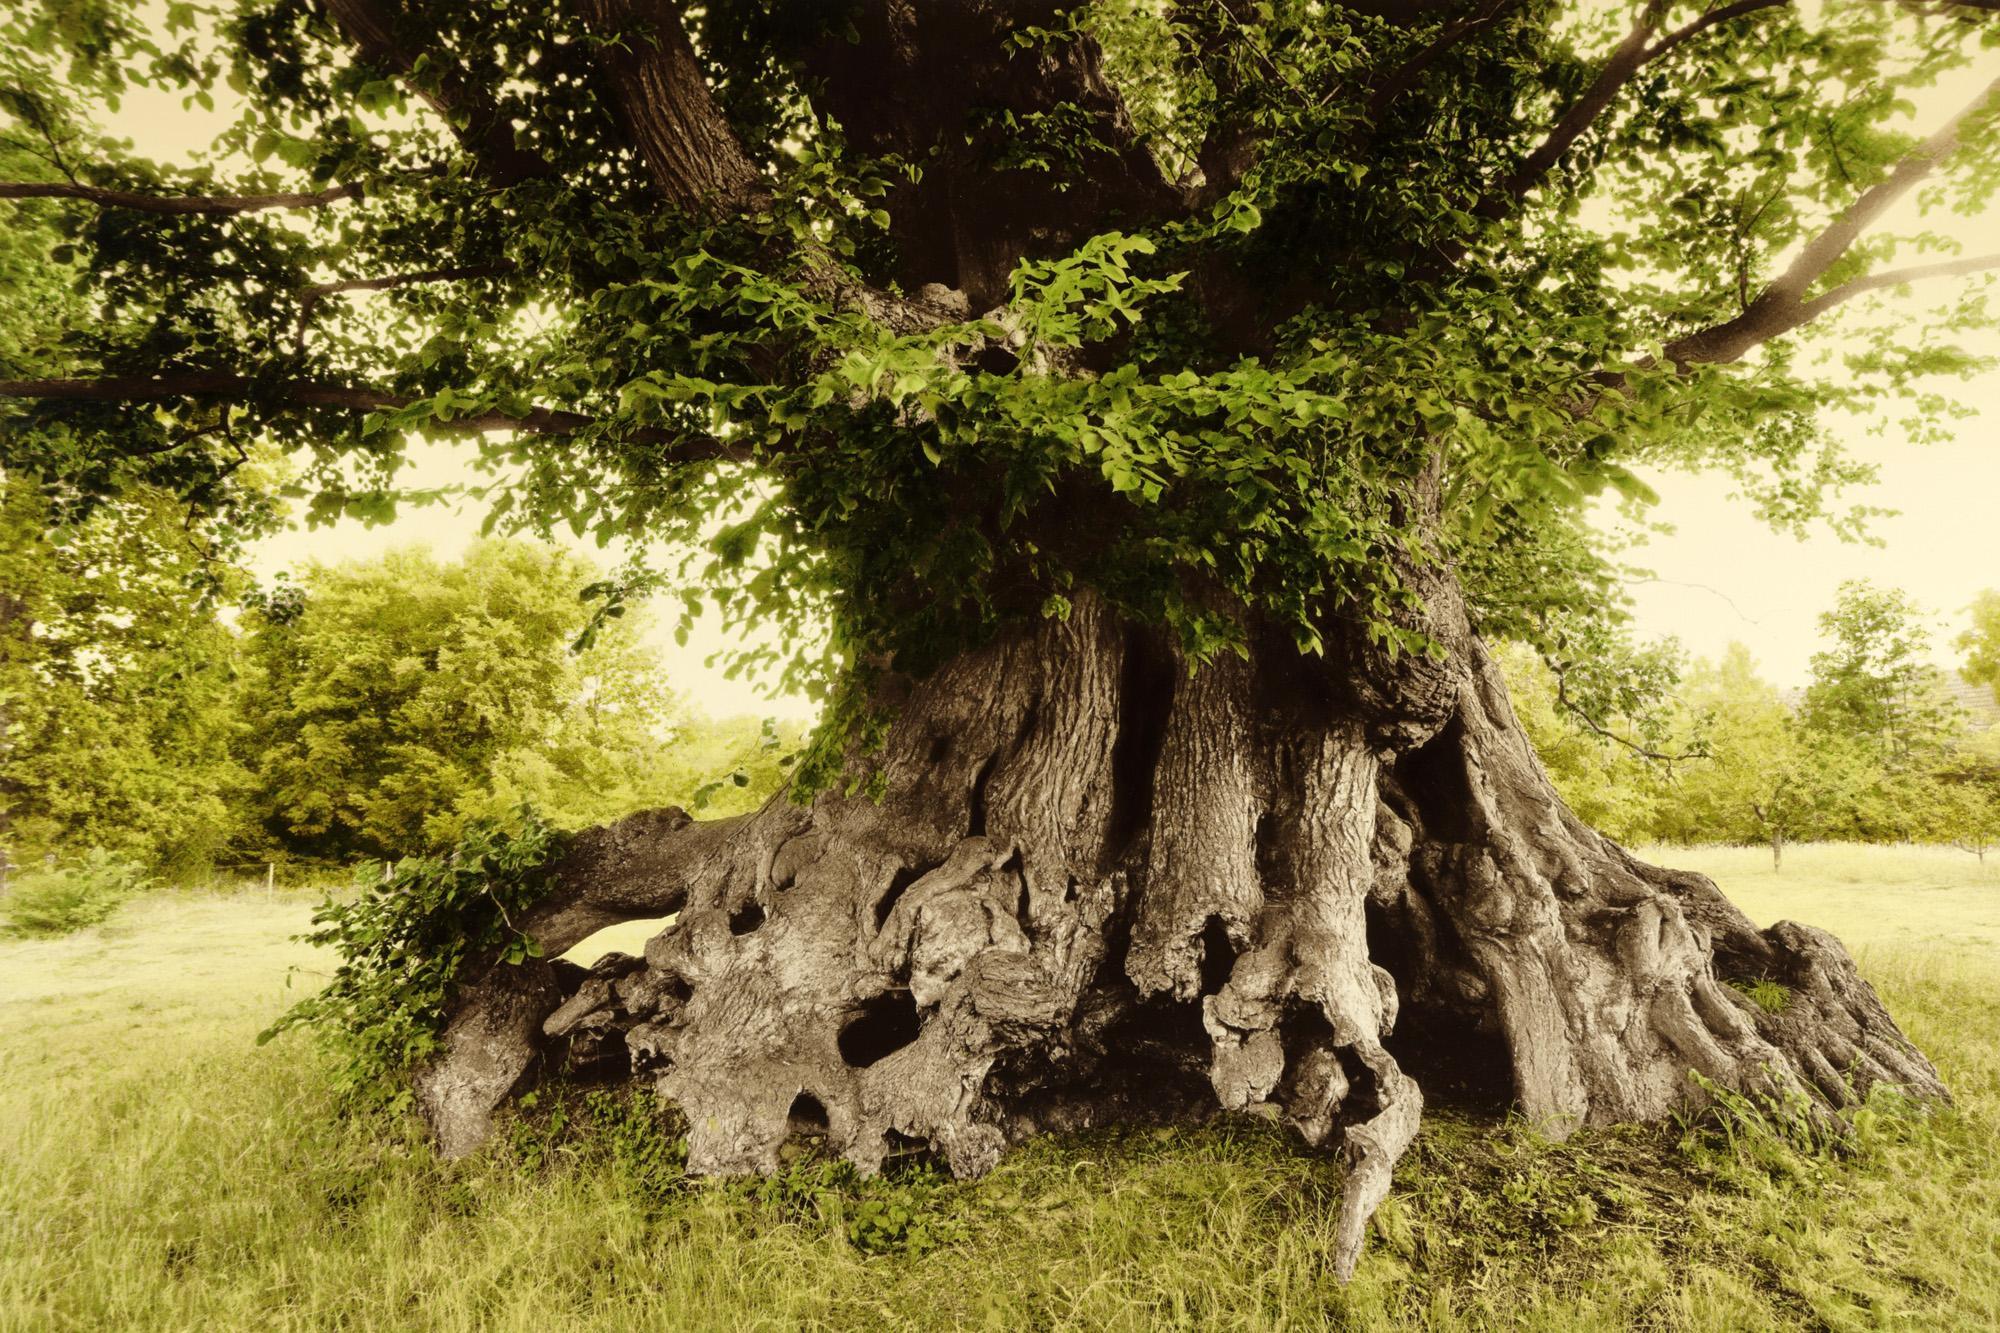 Ulme in Gülitz, Brandenburg / Alter ca. 350 - 500 Jahre, Umfang ca. 10 Meter